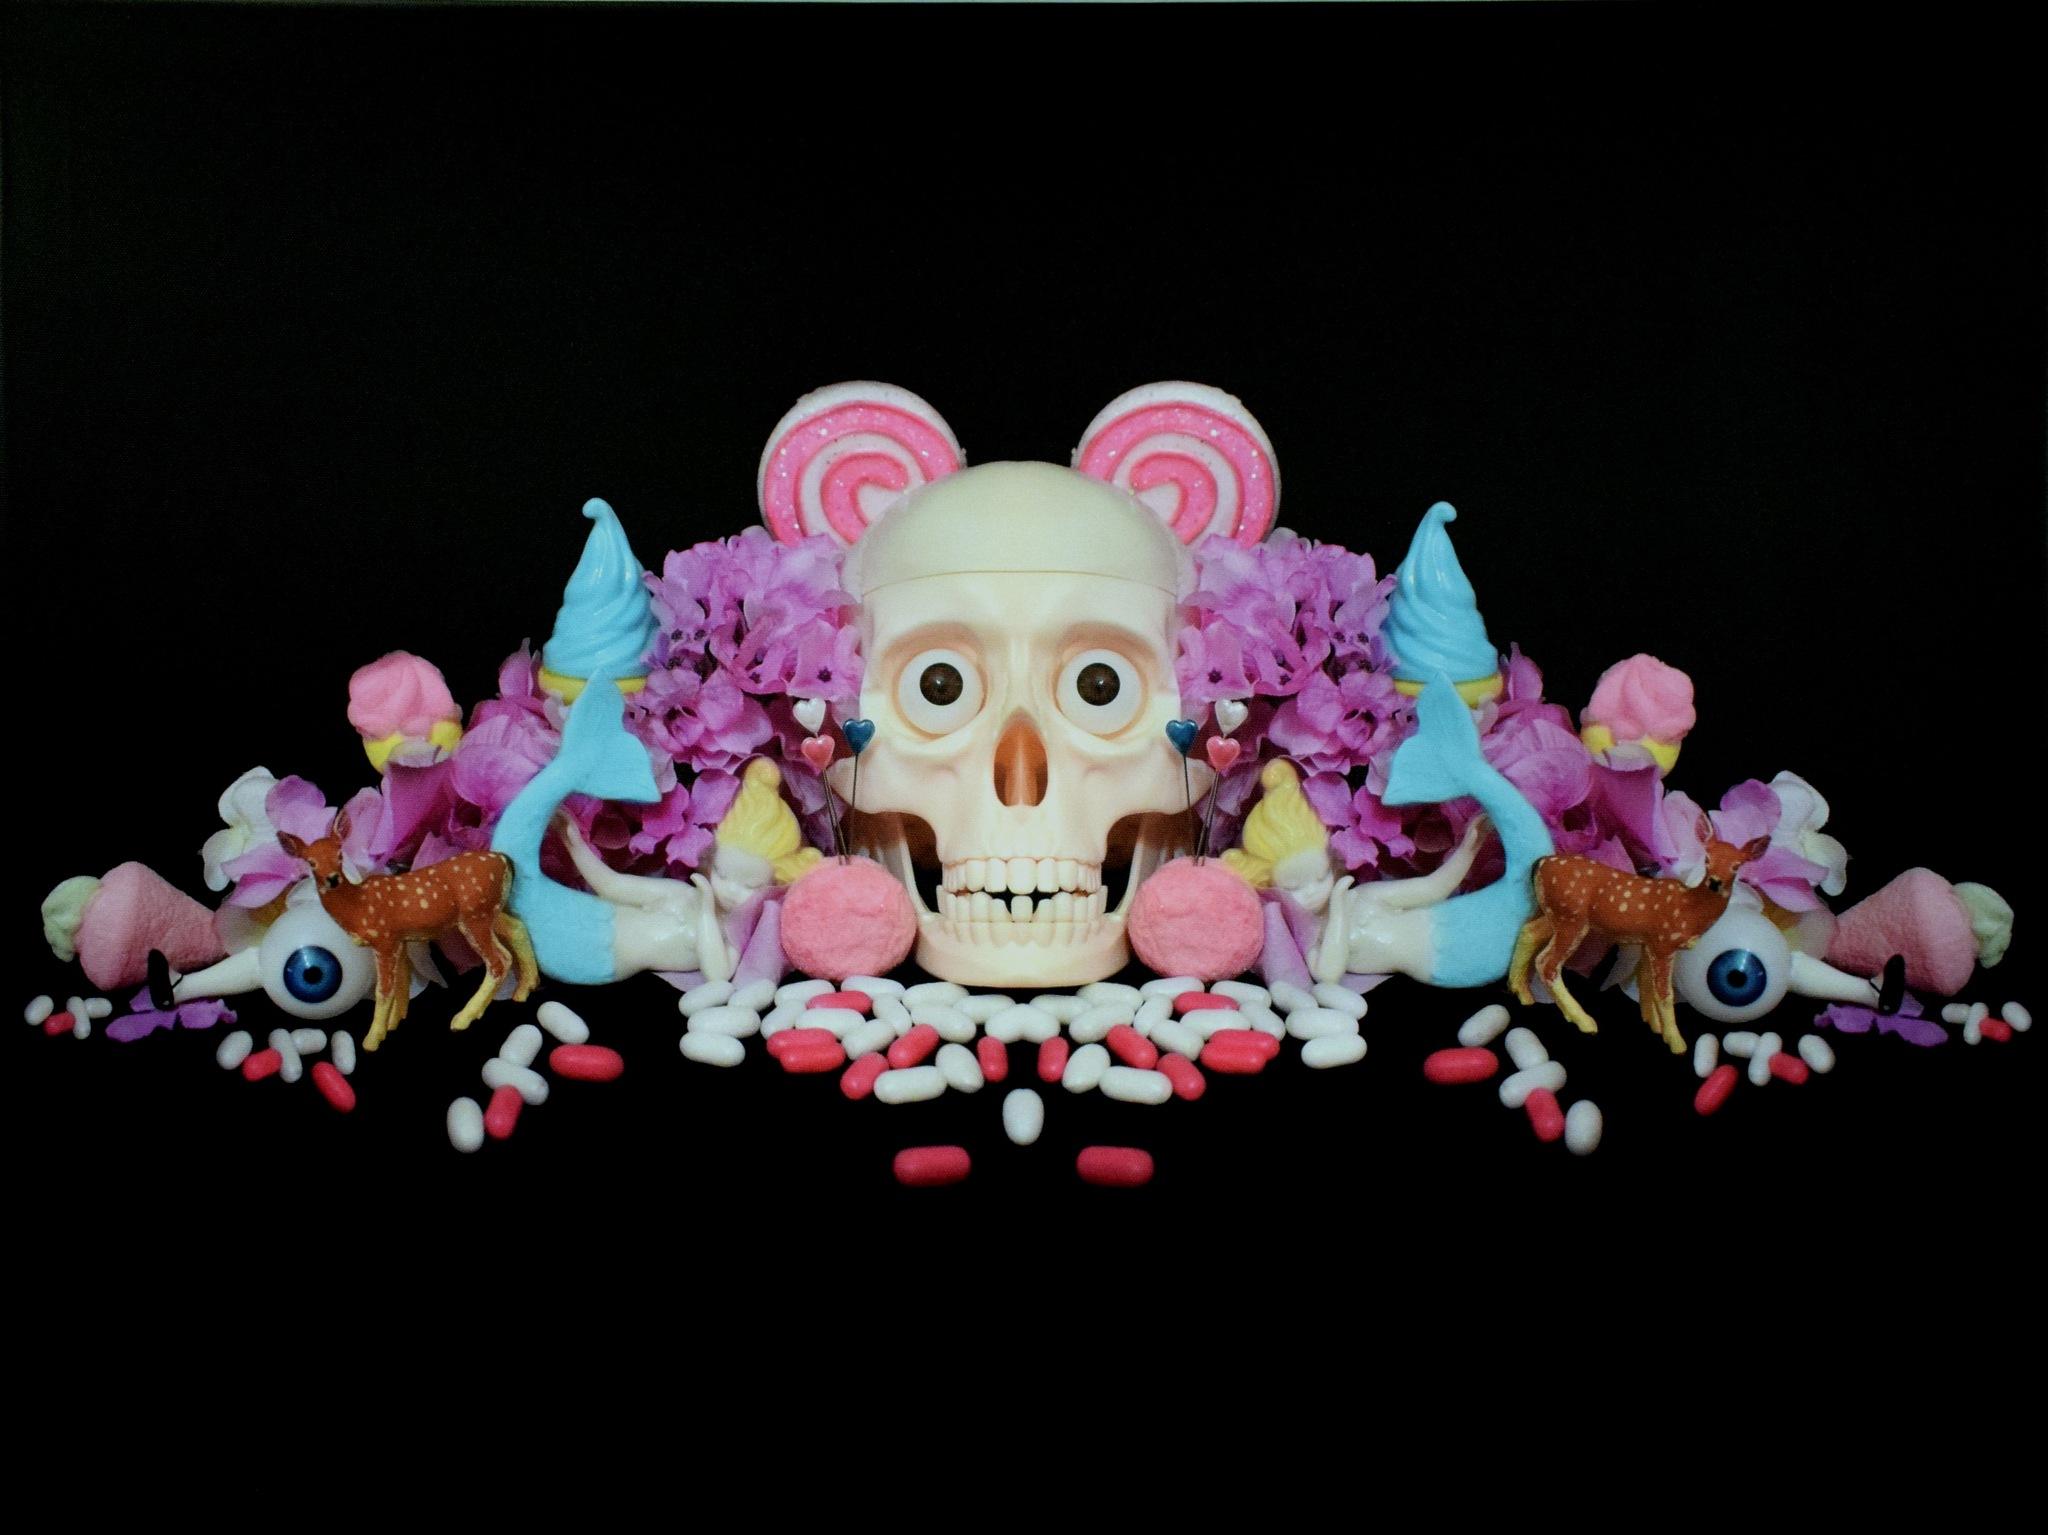 P.A.N. Napoli - Cristina Burns - Skull & Toys - Candyland - 20 by Arnaldo De Lisio